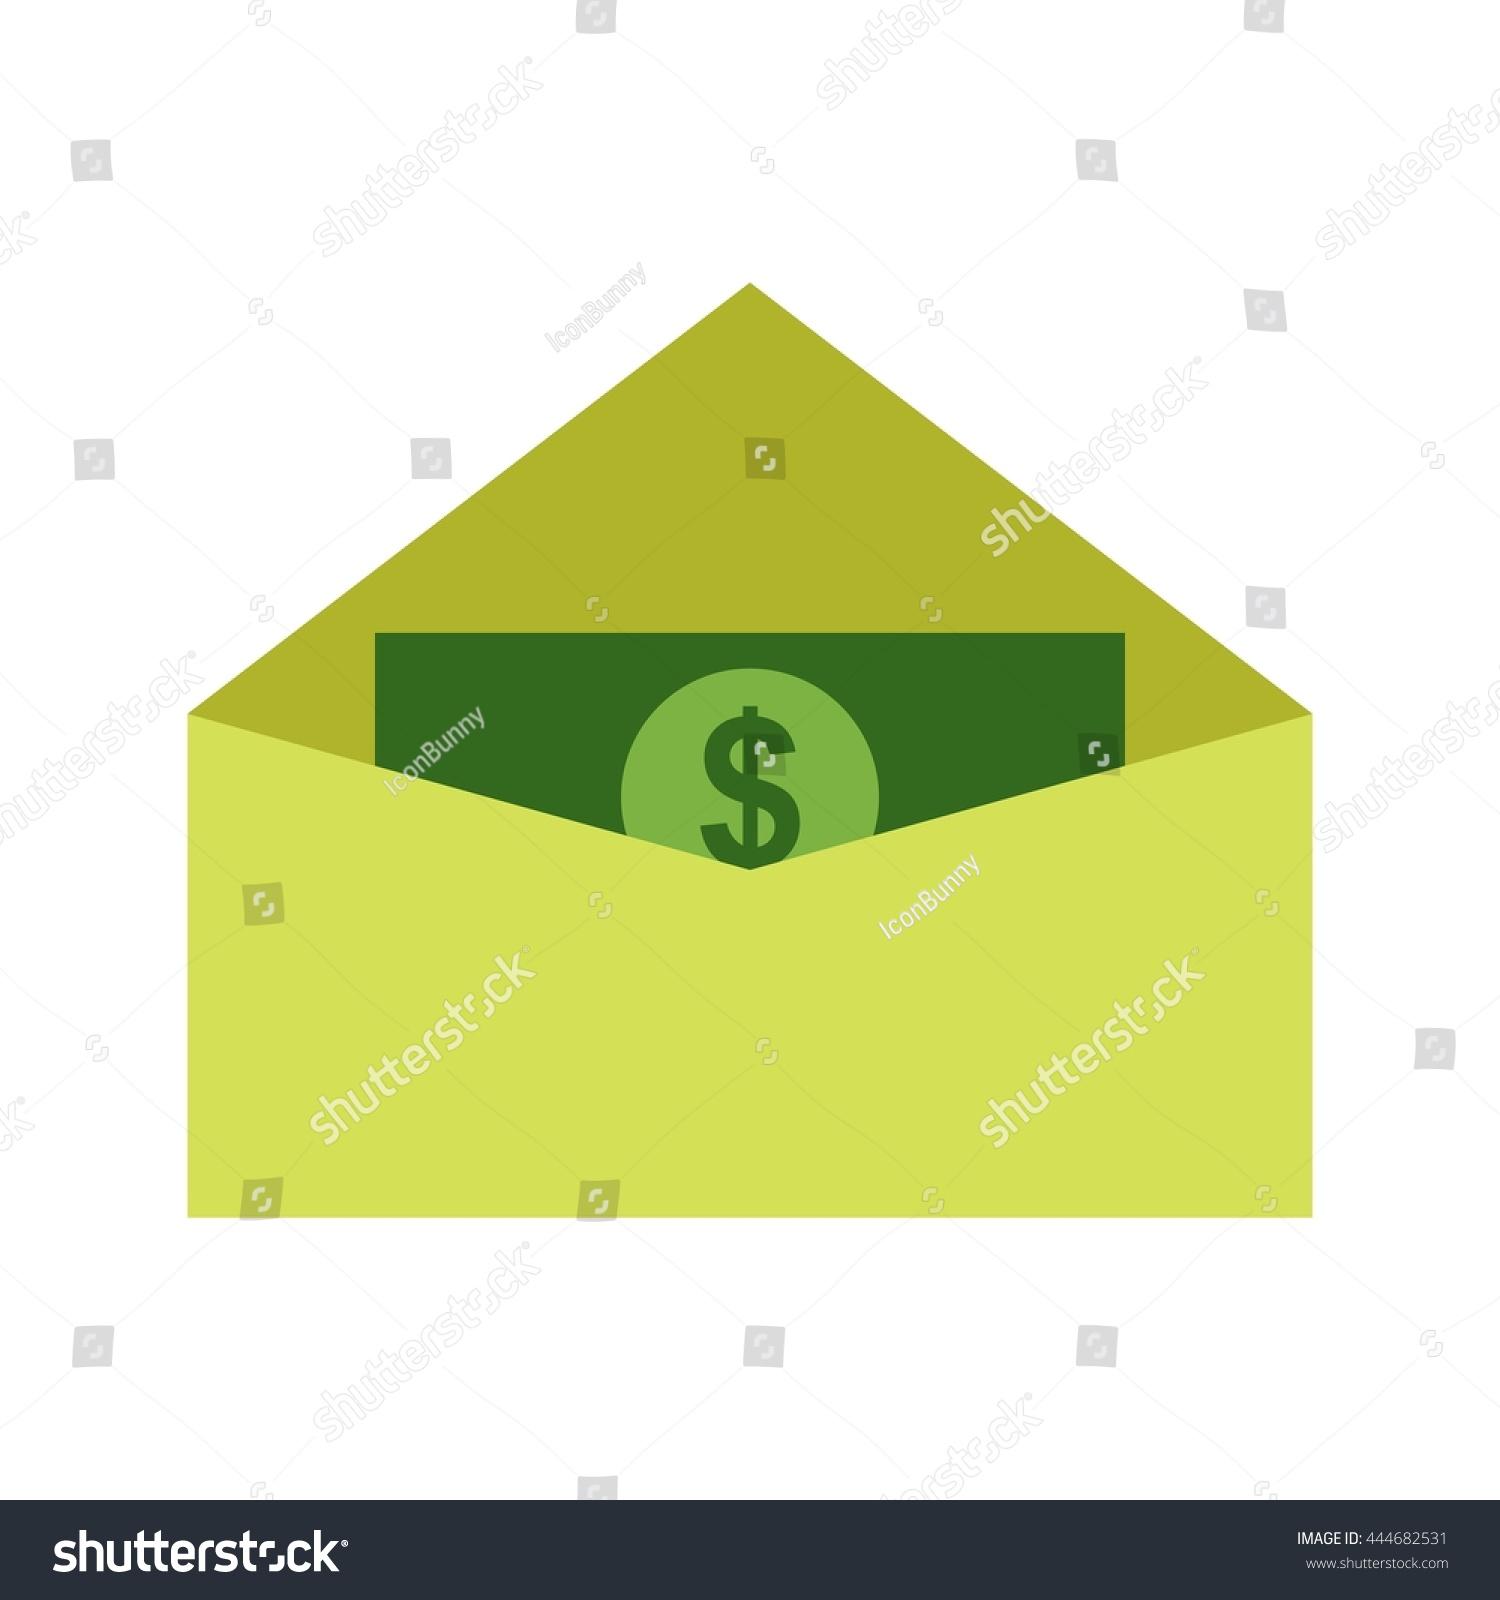 how to send money annomoulsy